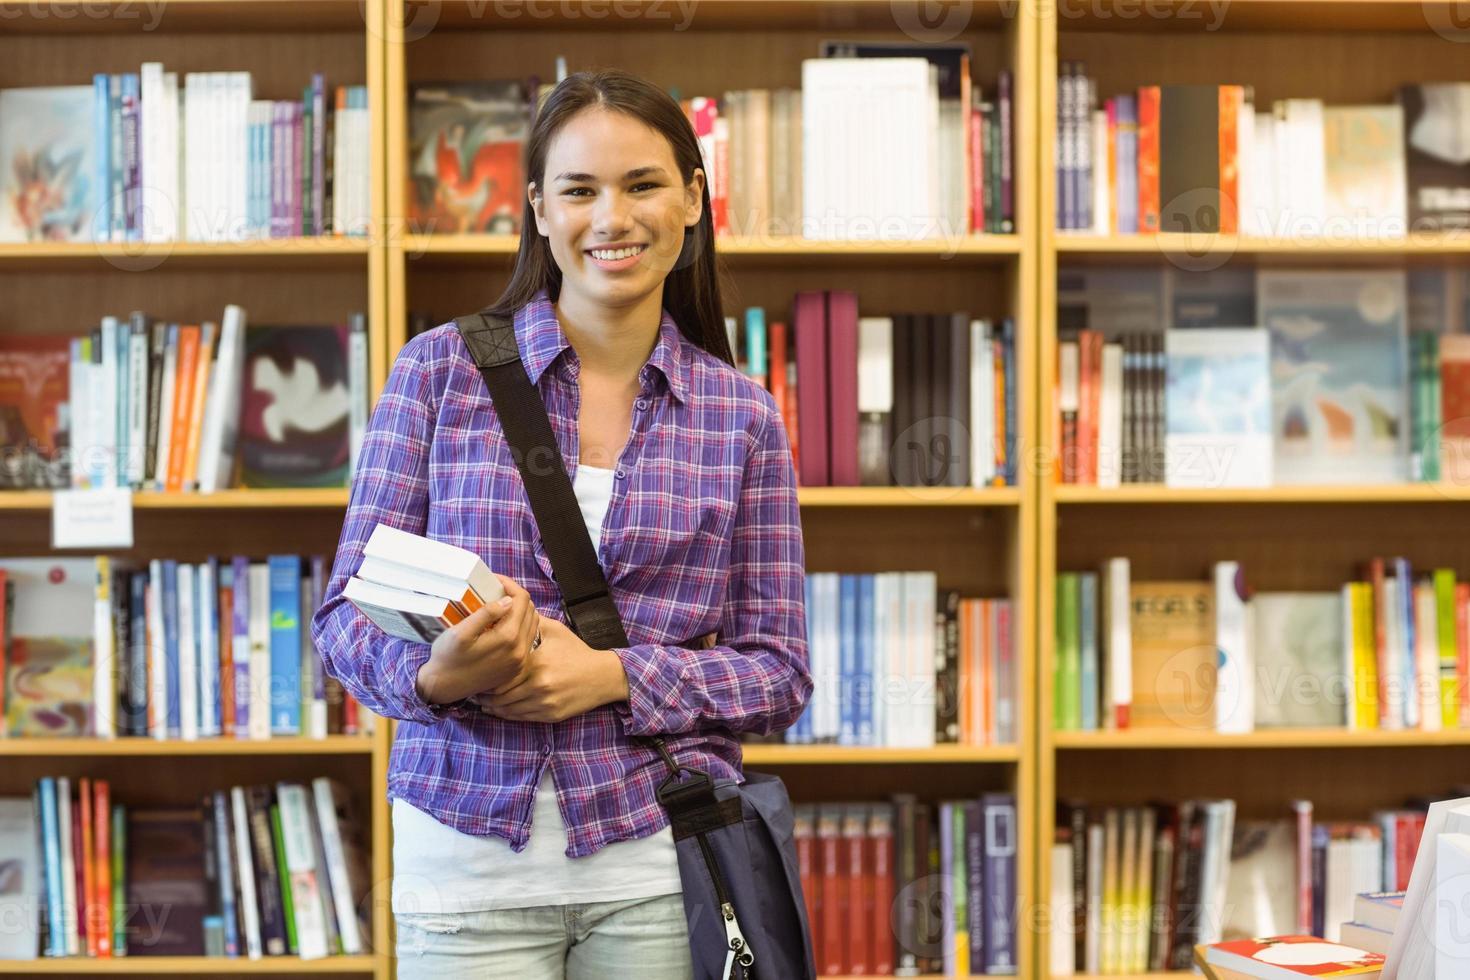 Smiling university student holding textbook photo